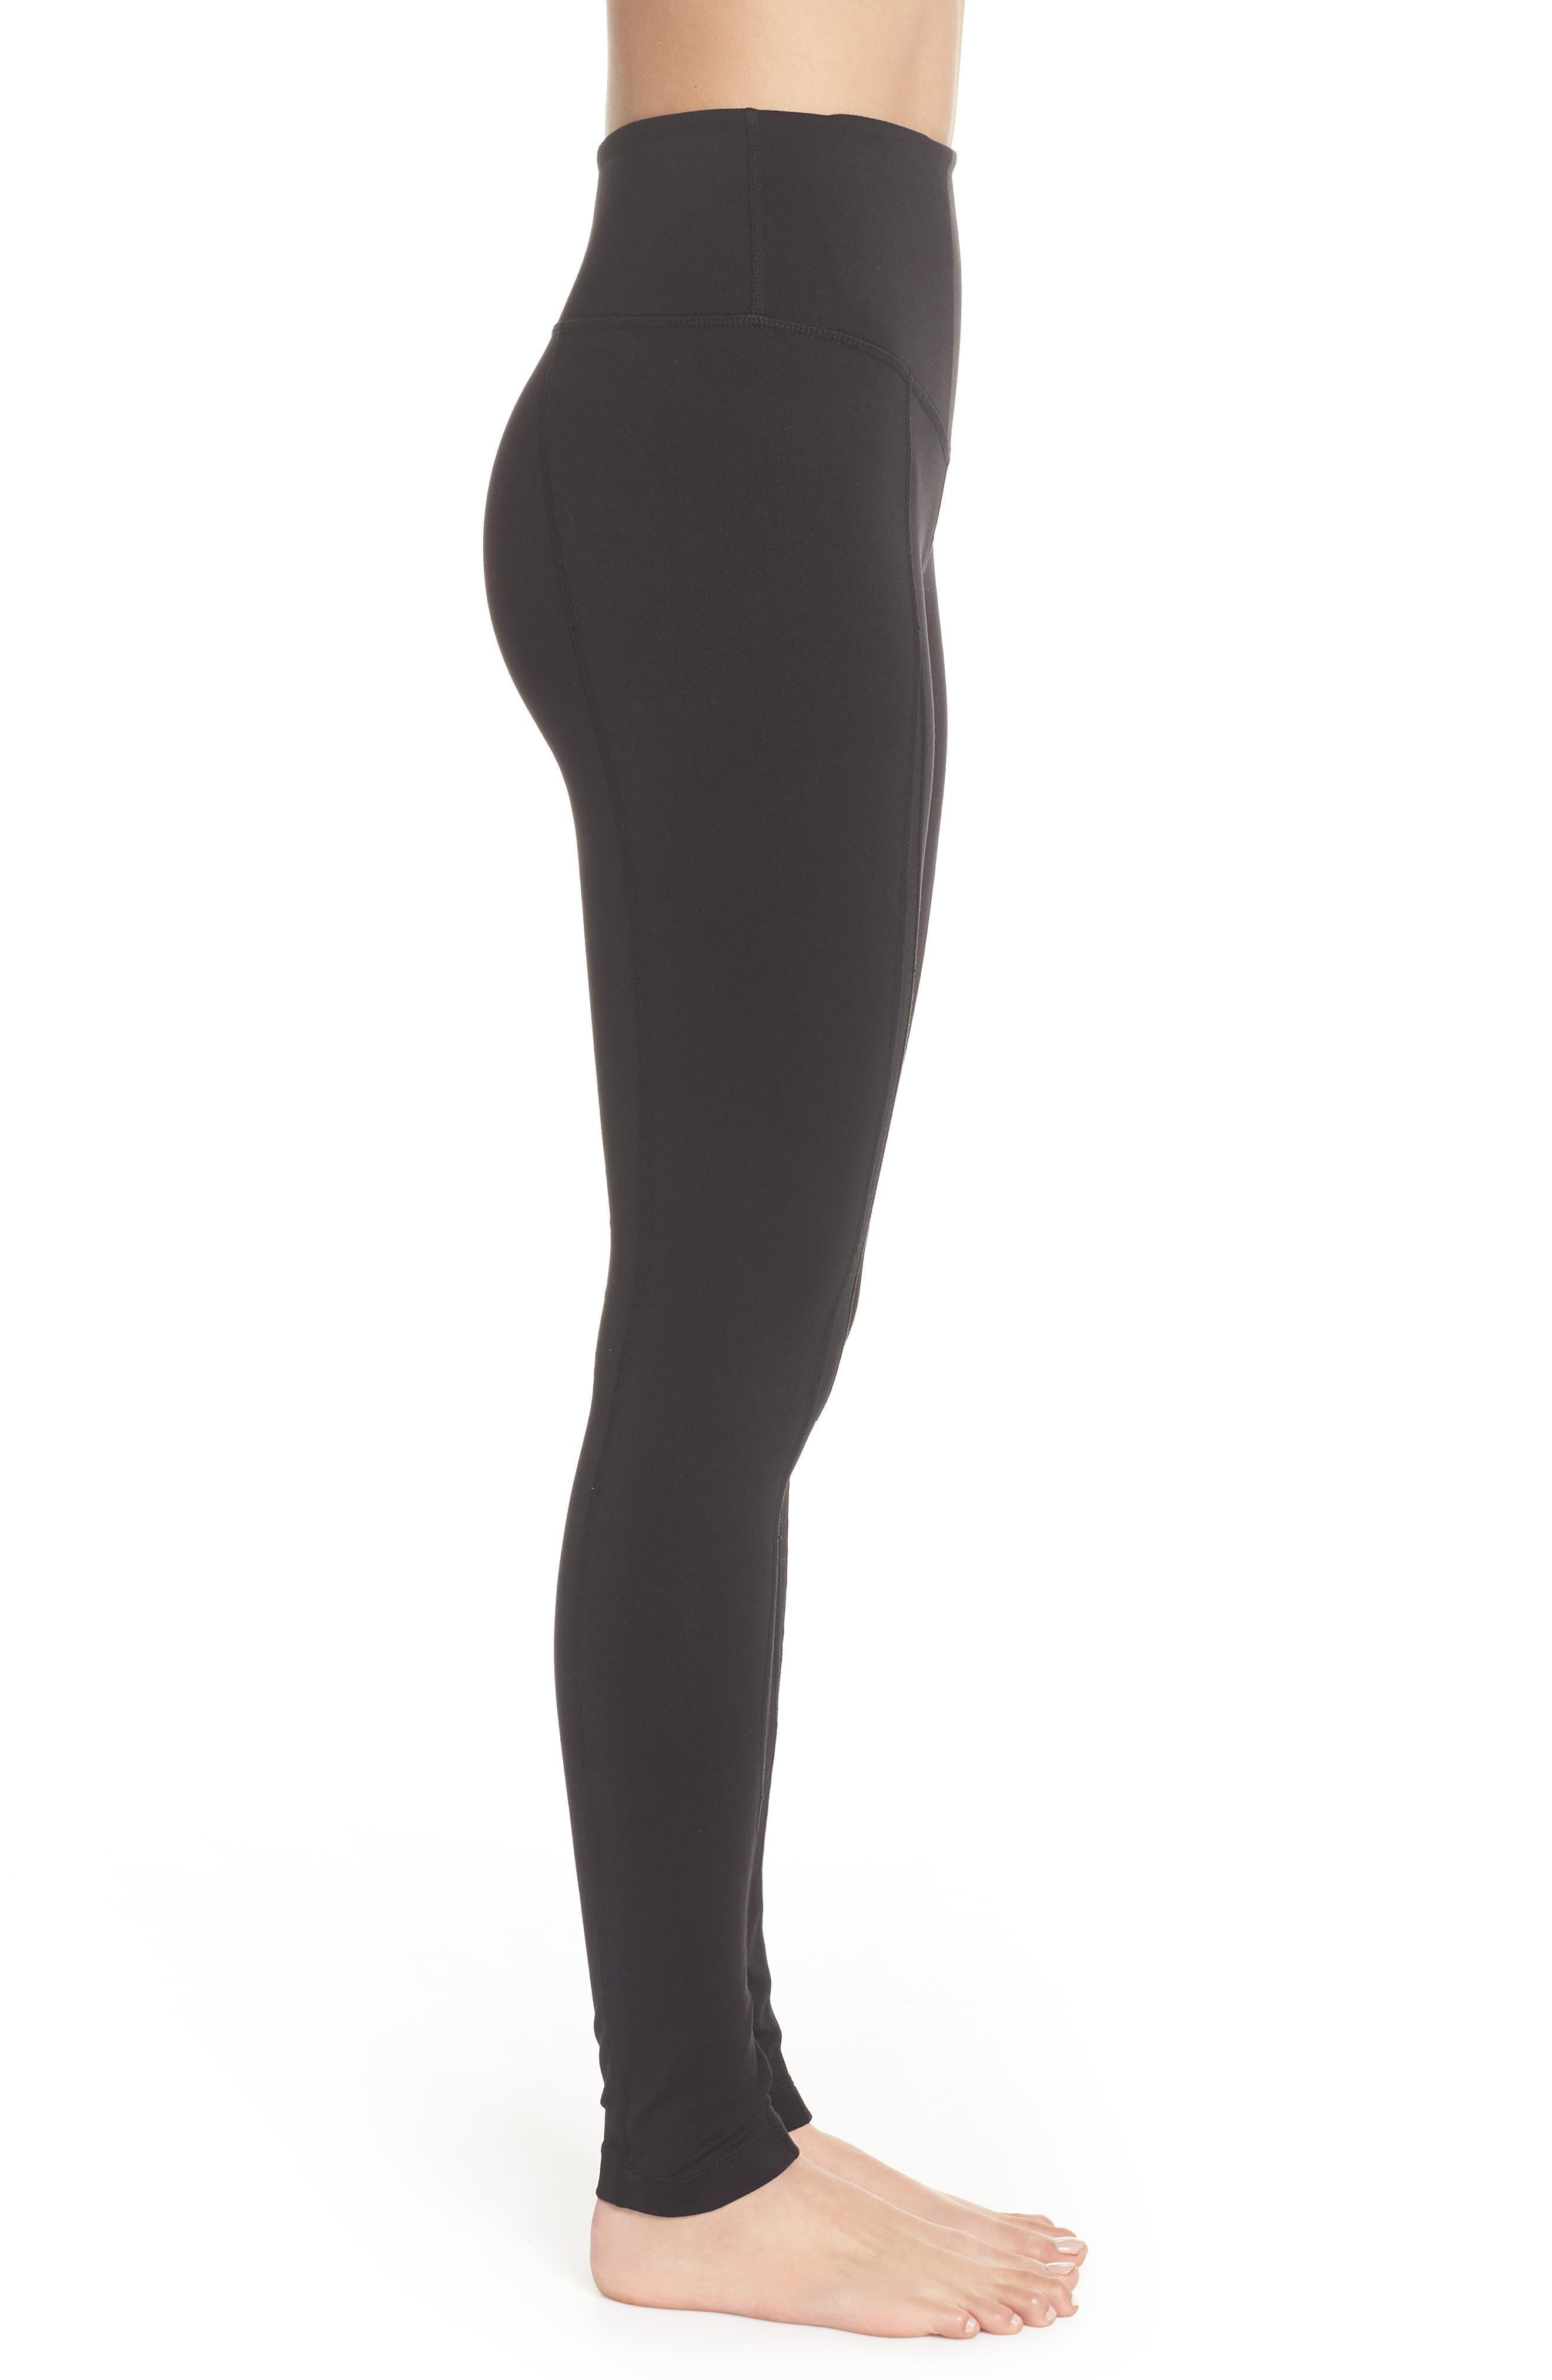 Reinvent Recycled High Waist Leggings,                             Alternate thumbnail 3, color,                             BLACK